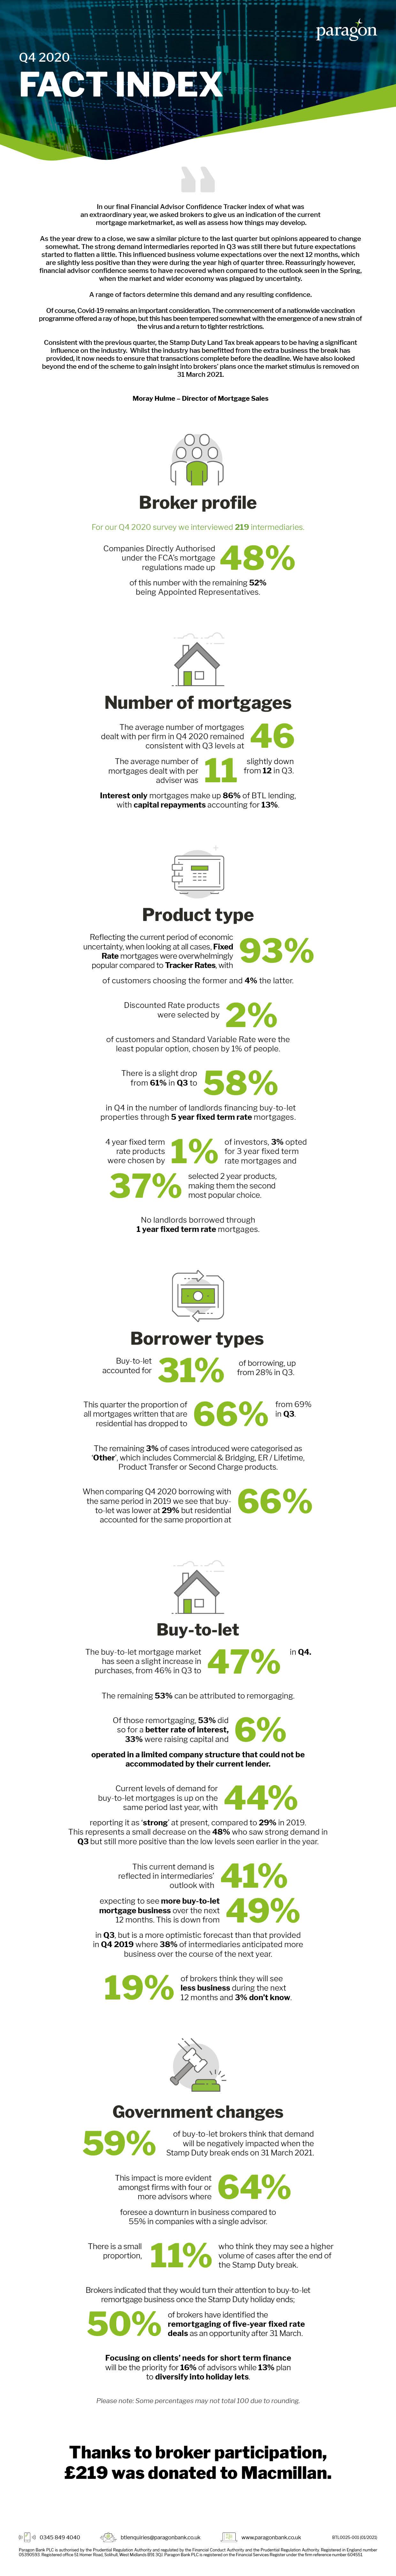 FACT Q4 Survey Infographic